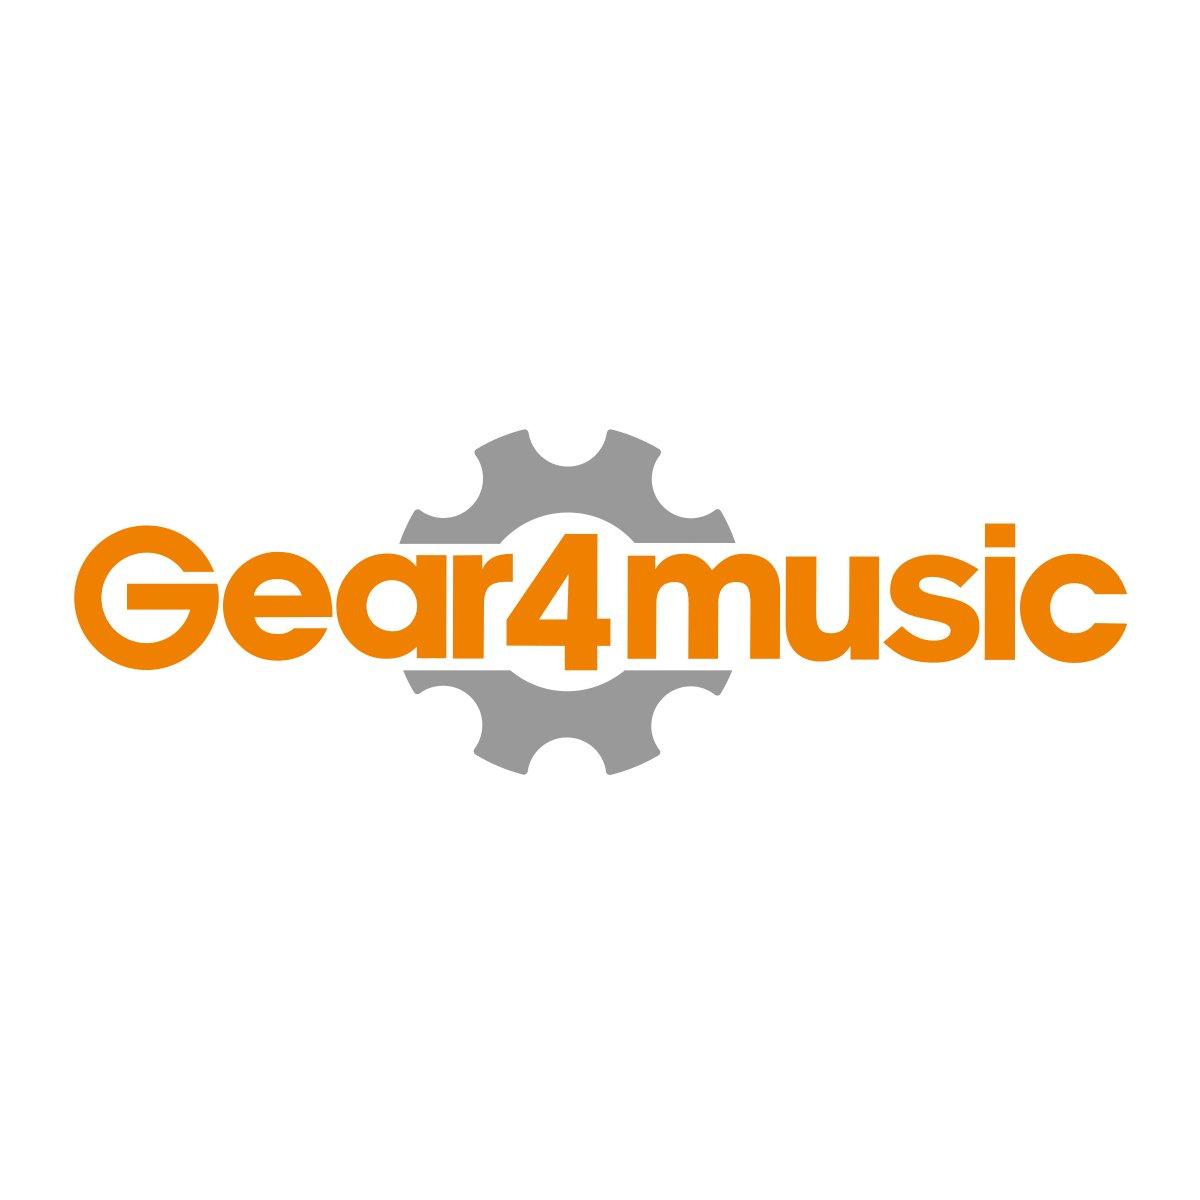 1/2 borsa imbottita per chitarra classica di Gear4music